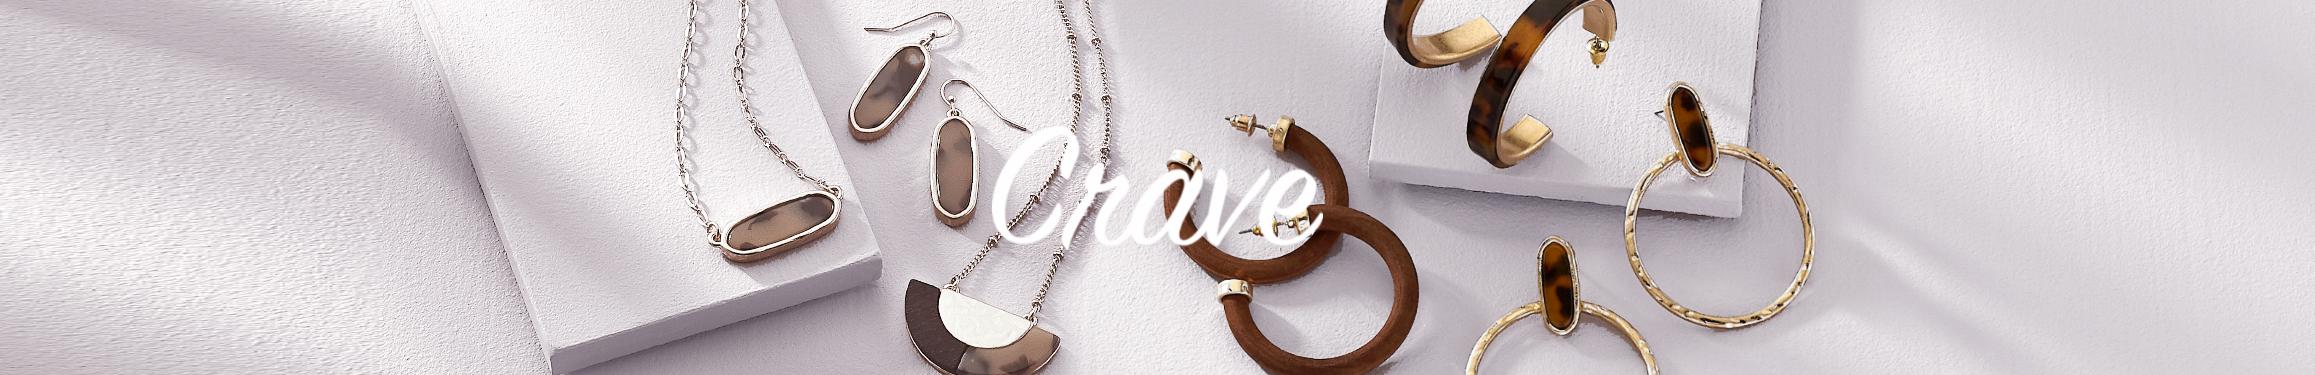 9-19 Crave